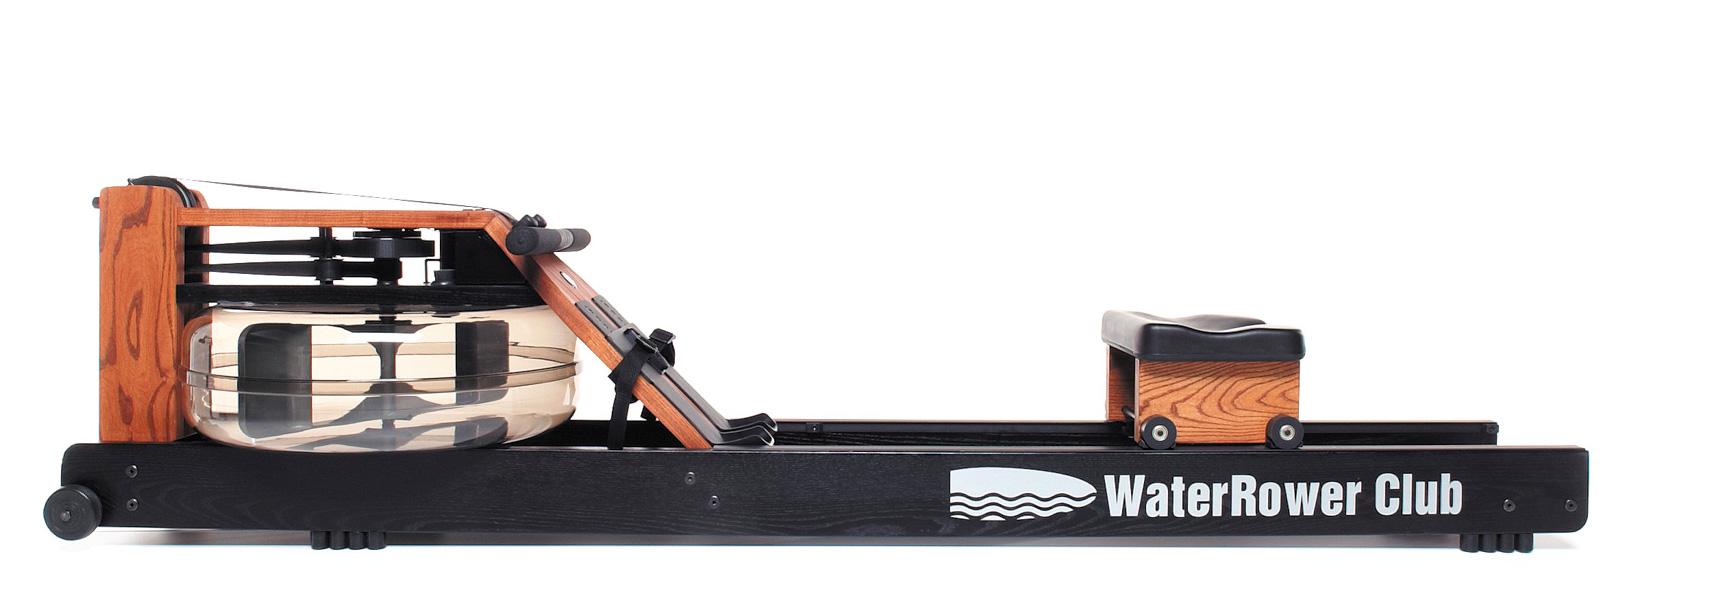 WaterRower Roeitrainer - Club - Gratis montage